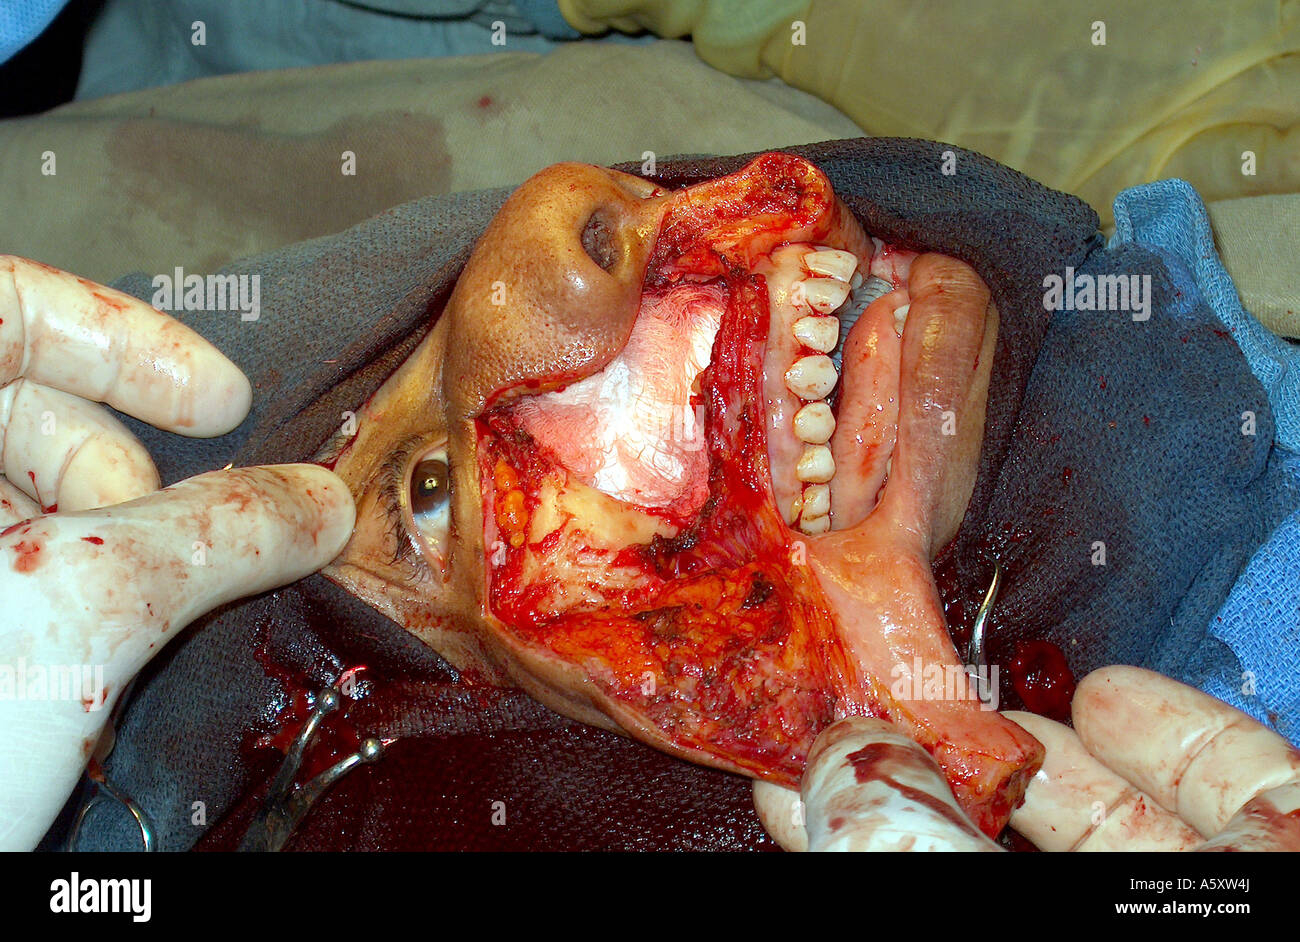 Hotttttt facial twitching and brain tumors can